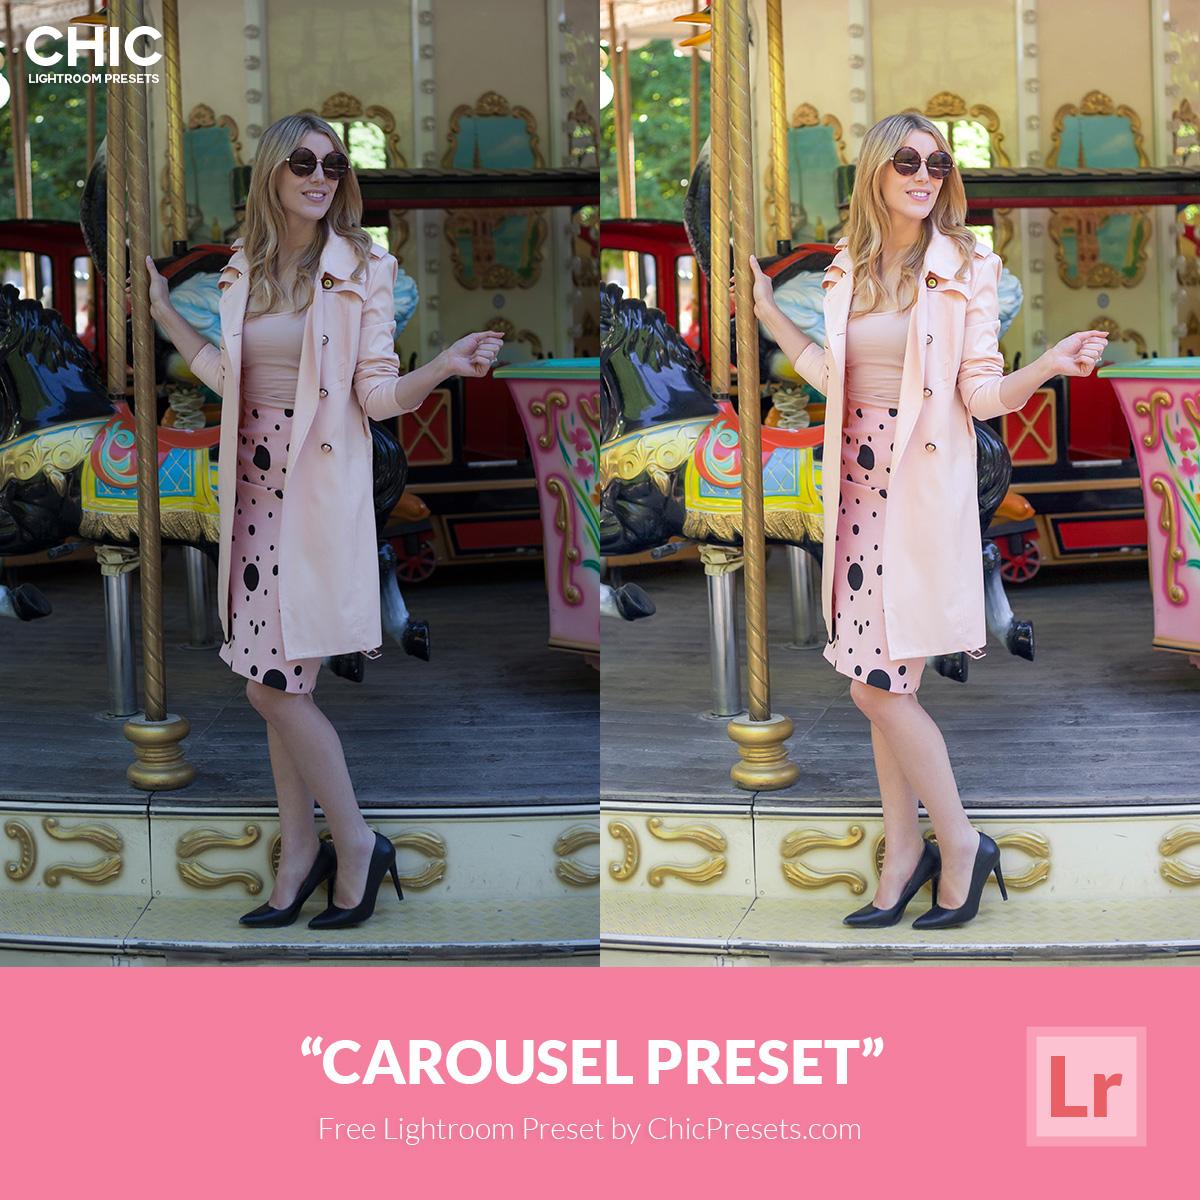 Free Lightroom Preset | Carousel